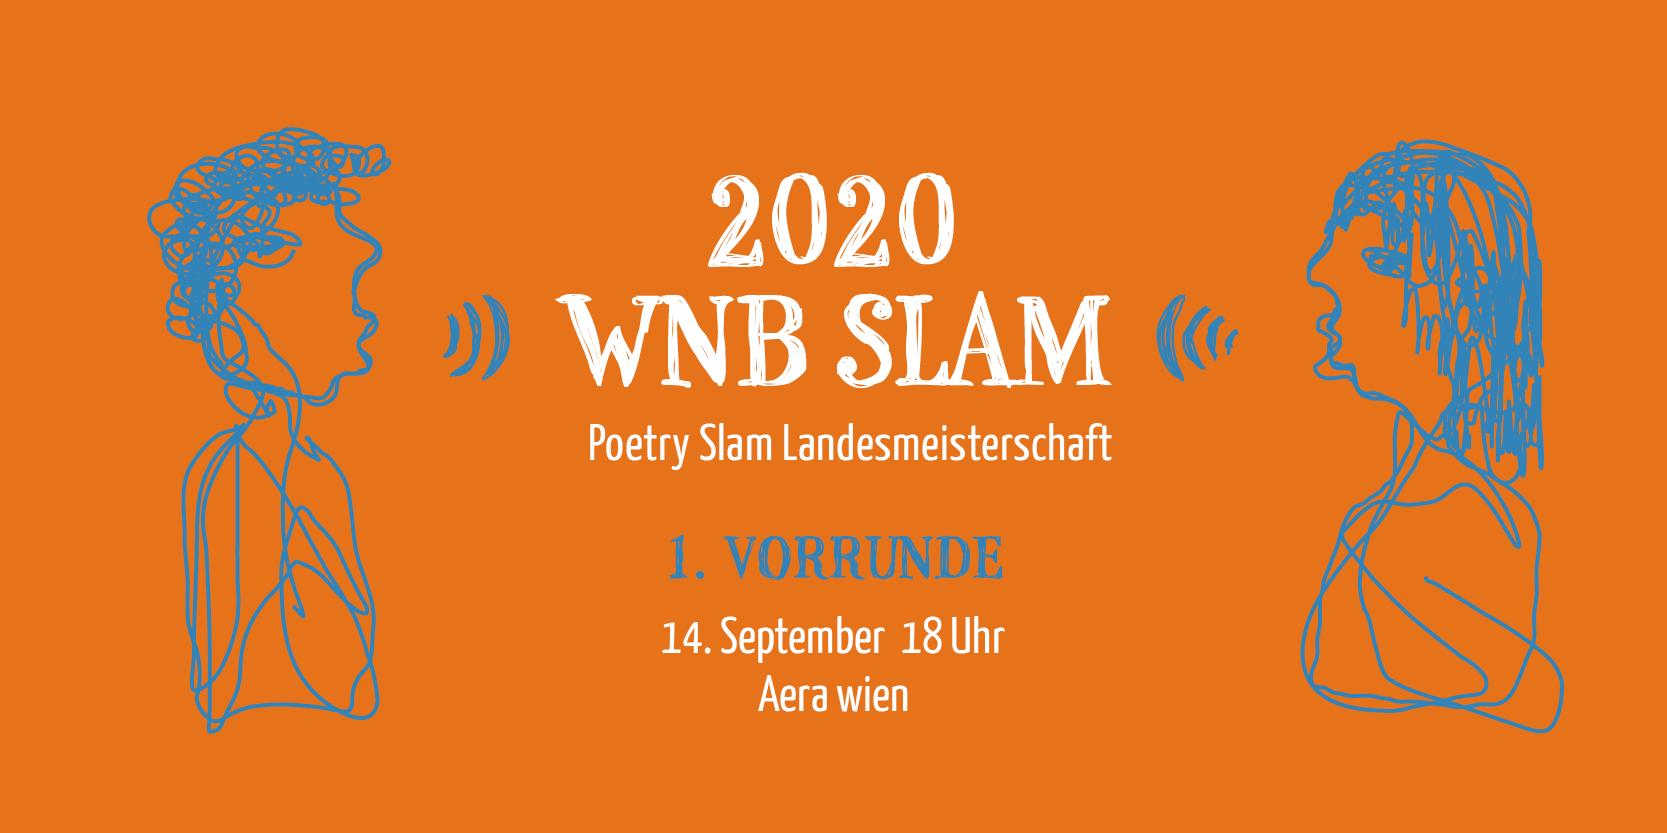 WNB SLAM 2020 Vorrunde 1 am 14. September 2020 @ Aera.